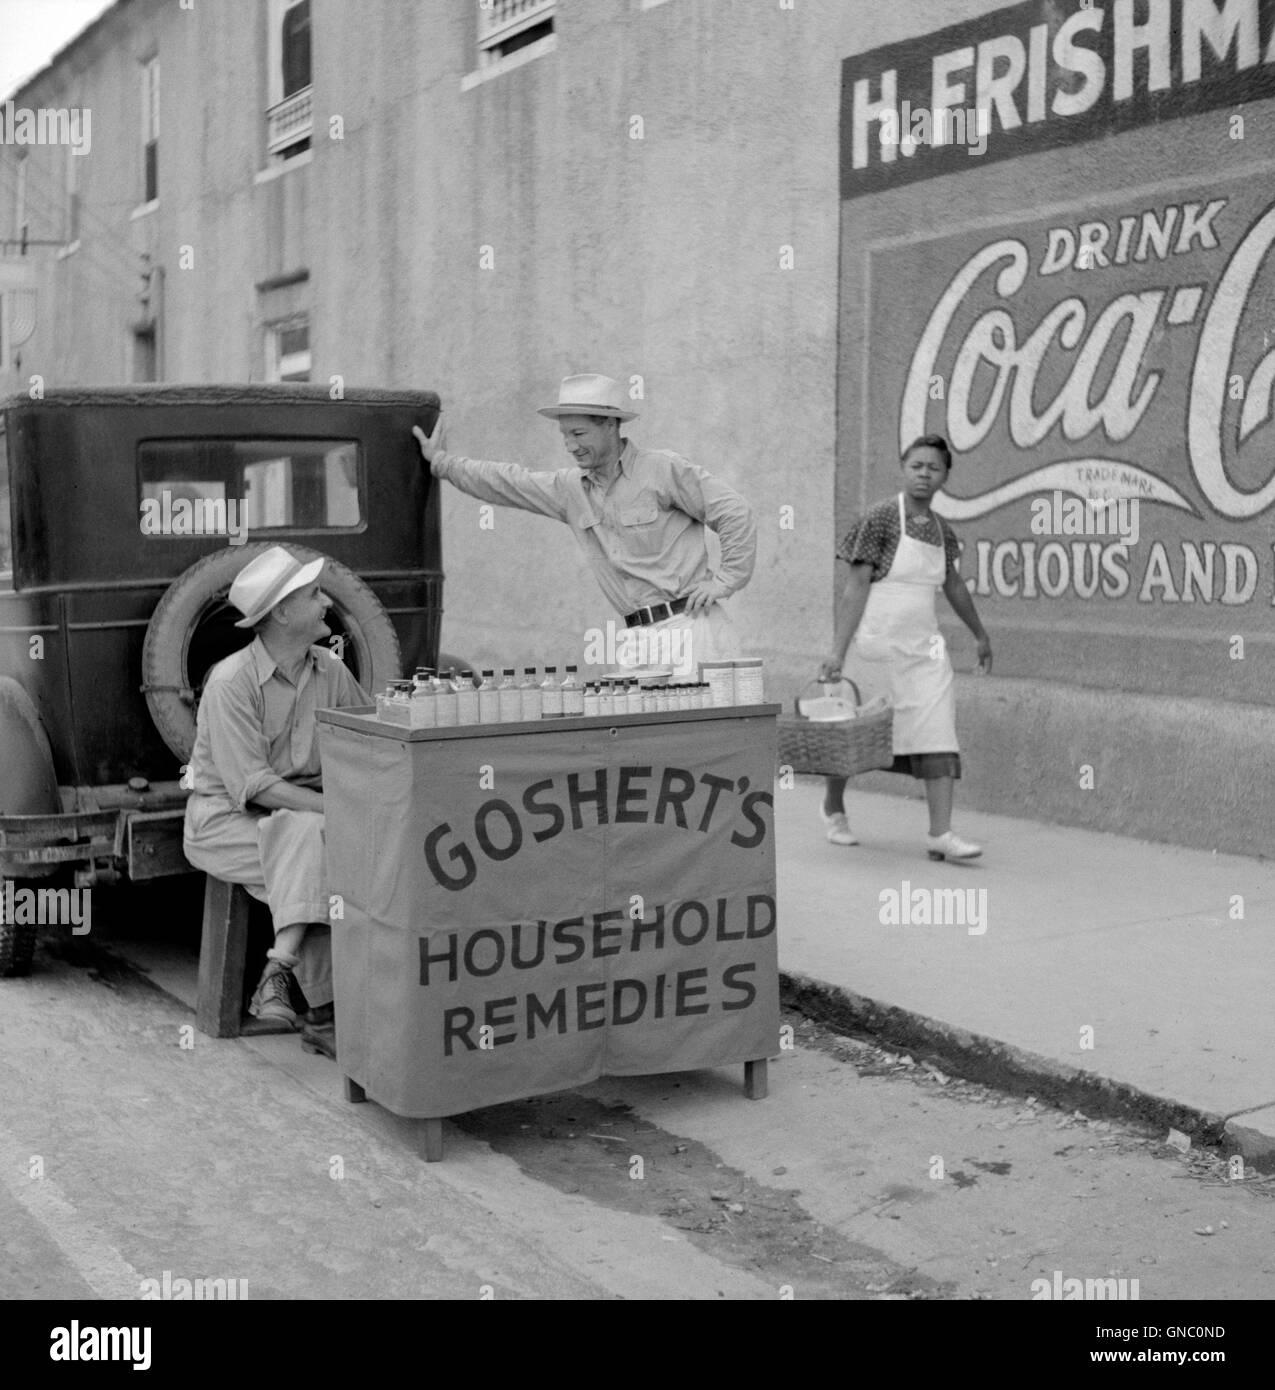 Street Vendor Black and White Stock Photos & Images - Alamy